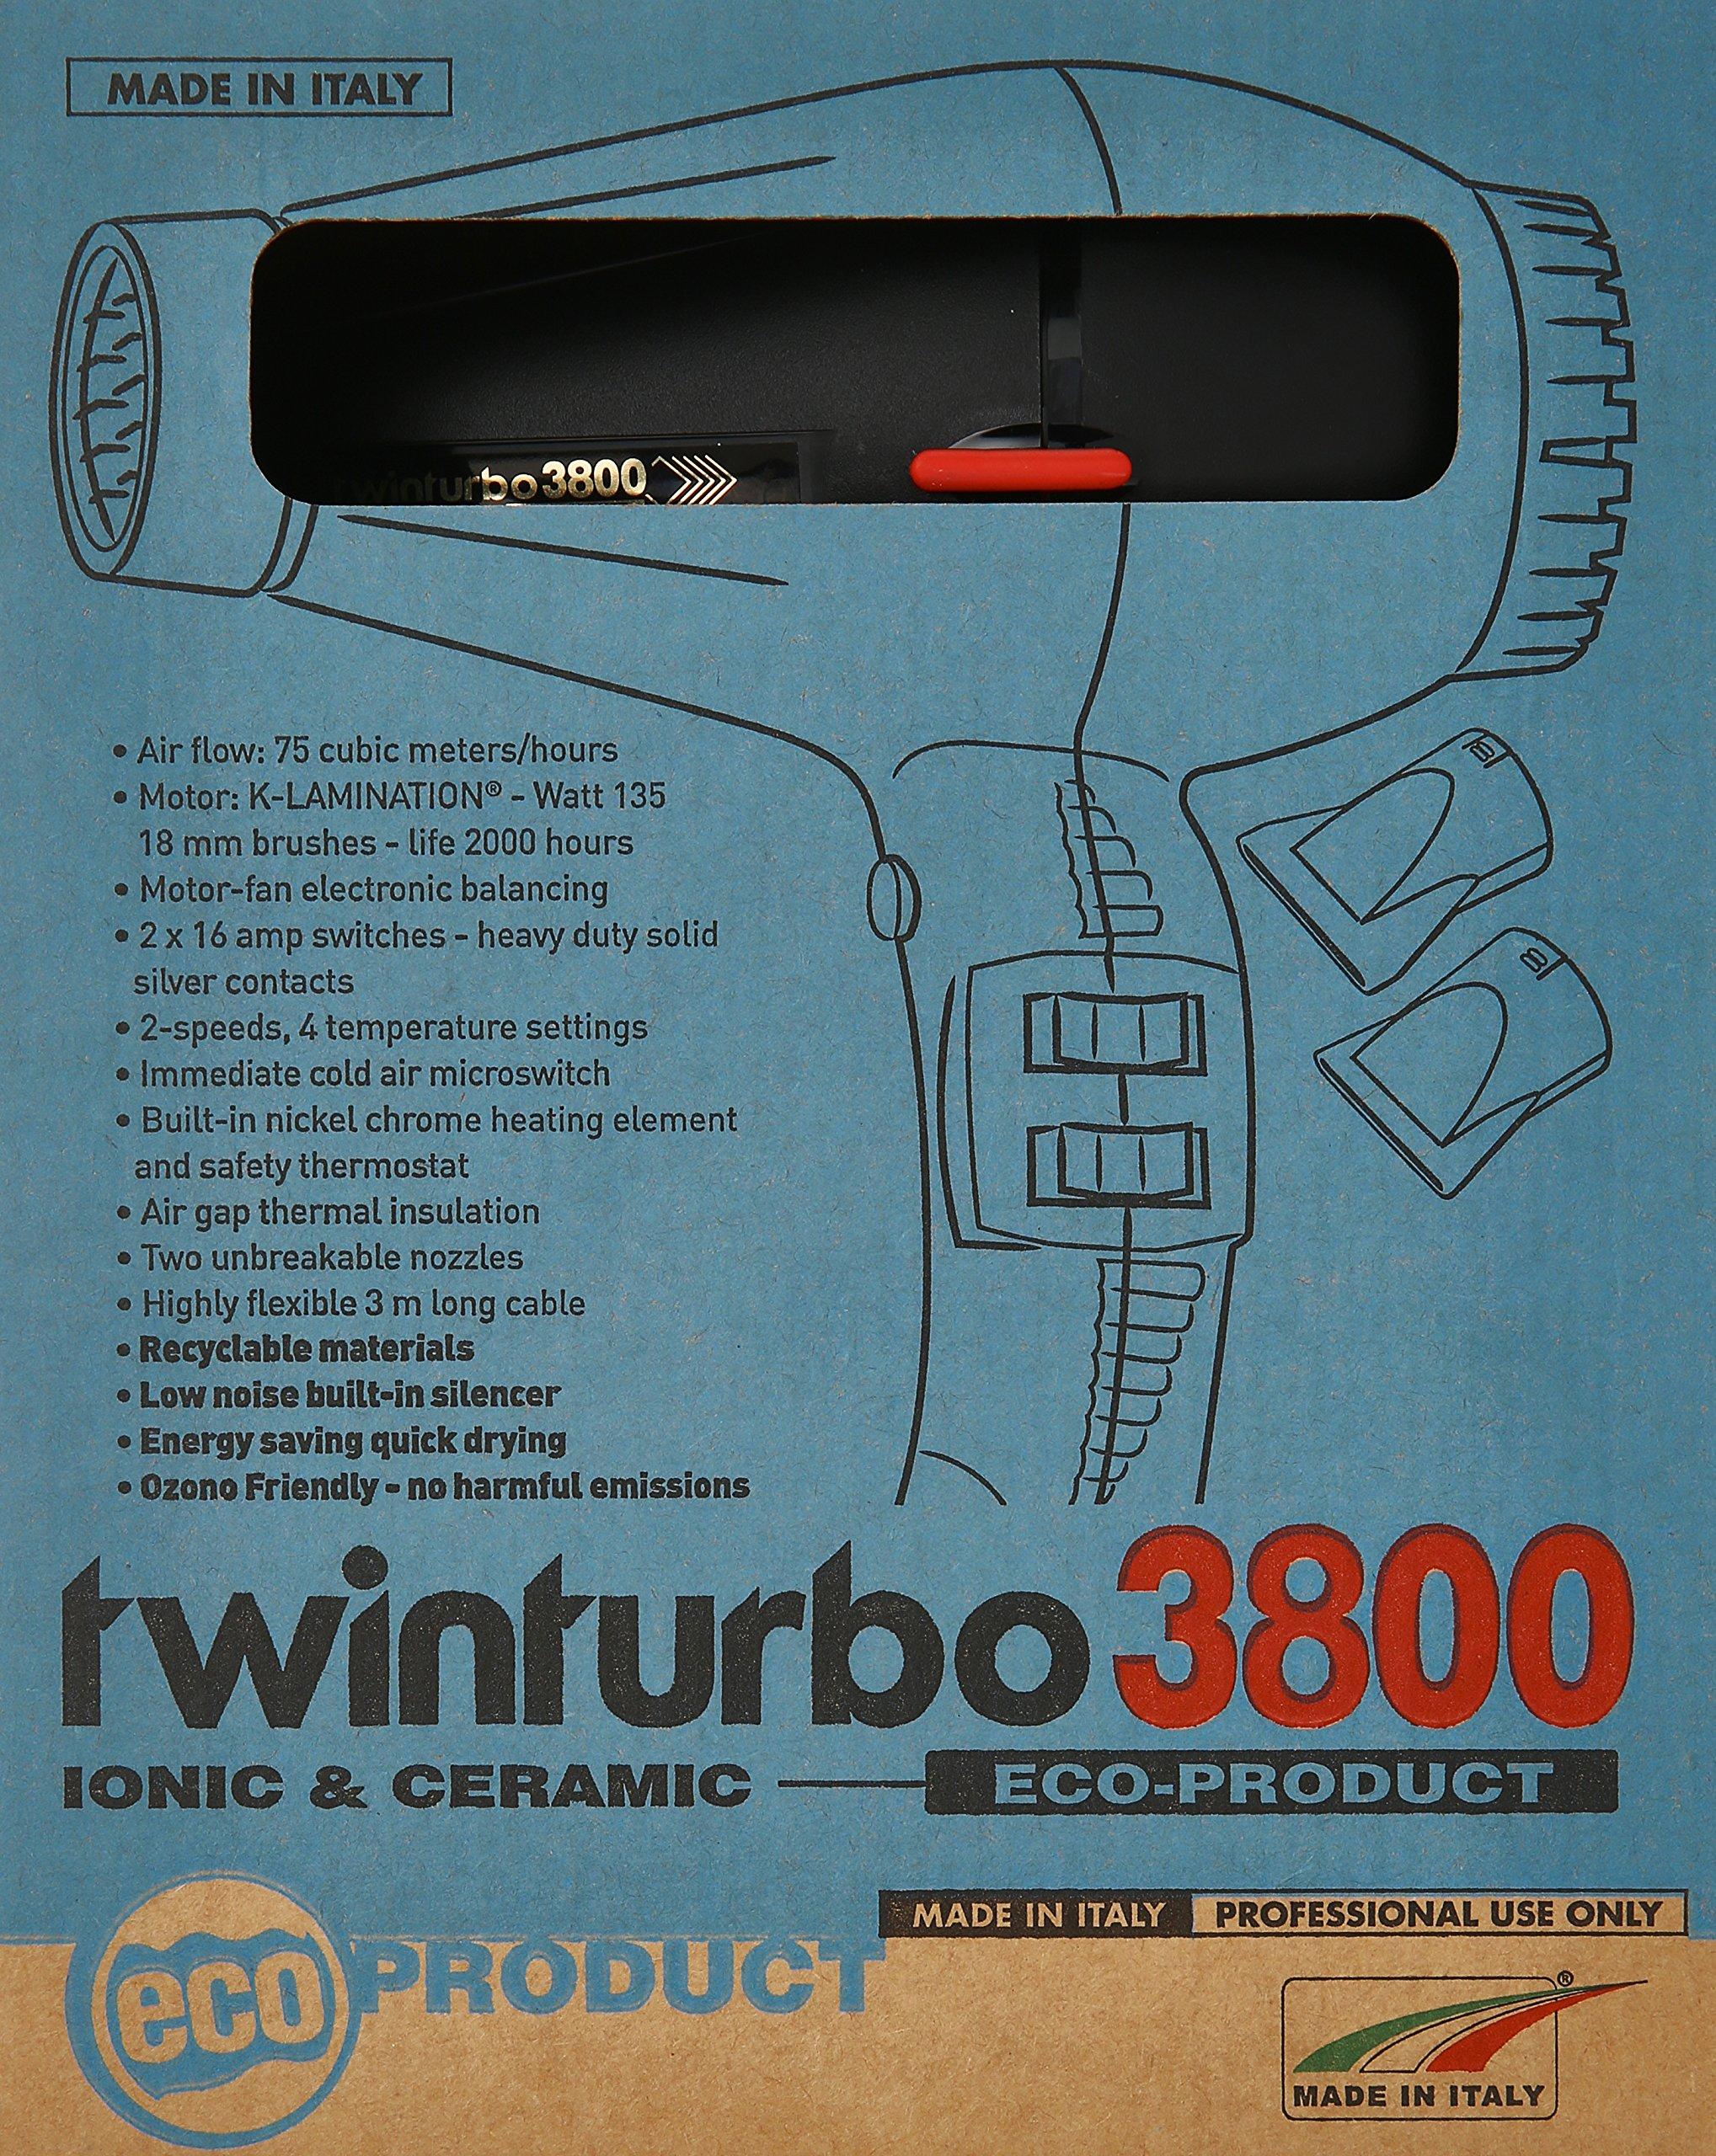 Pibbs TTEC8012 Twin Turbo 3800 Professional Ionic and Ceramic Hair Dryer, Black, 2100 Watt by Pibbs